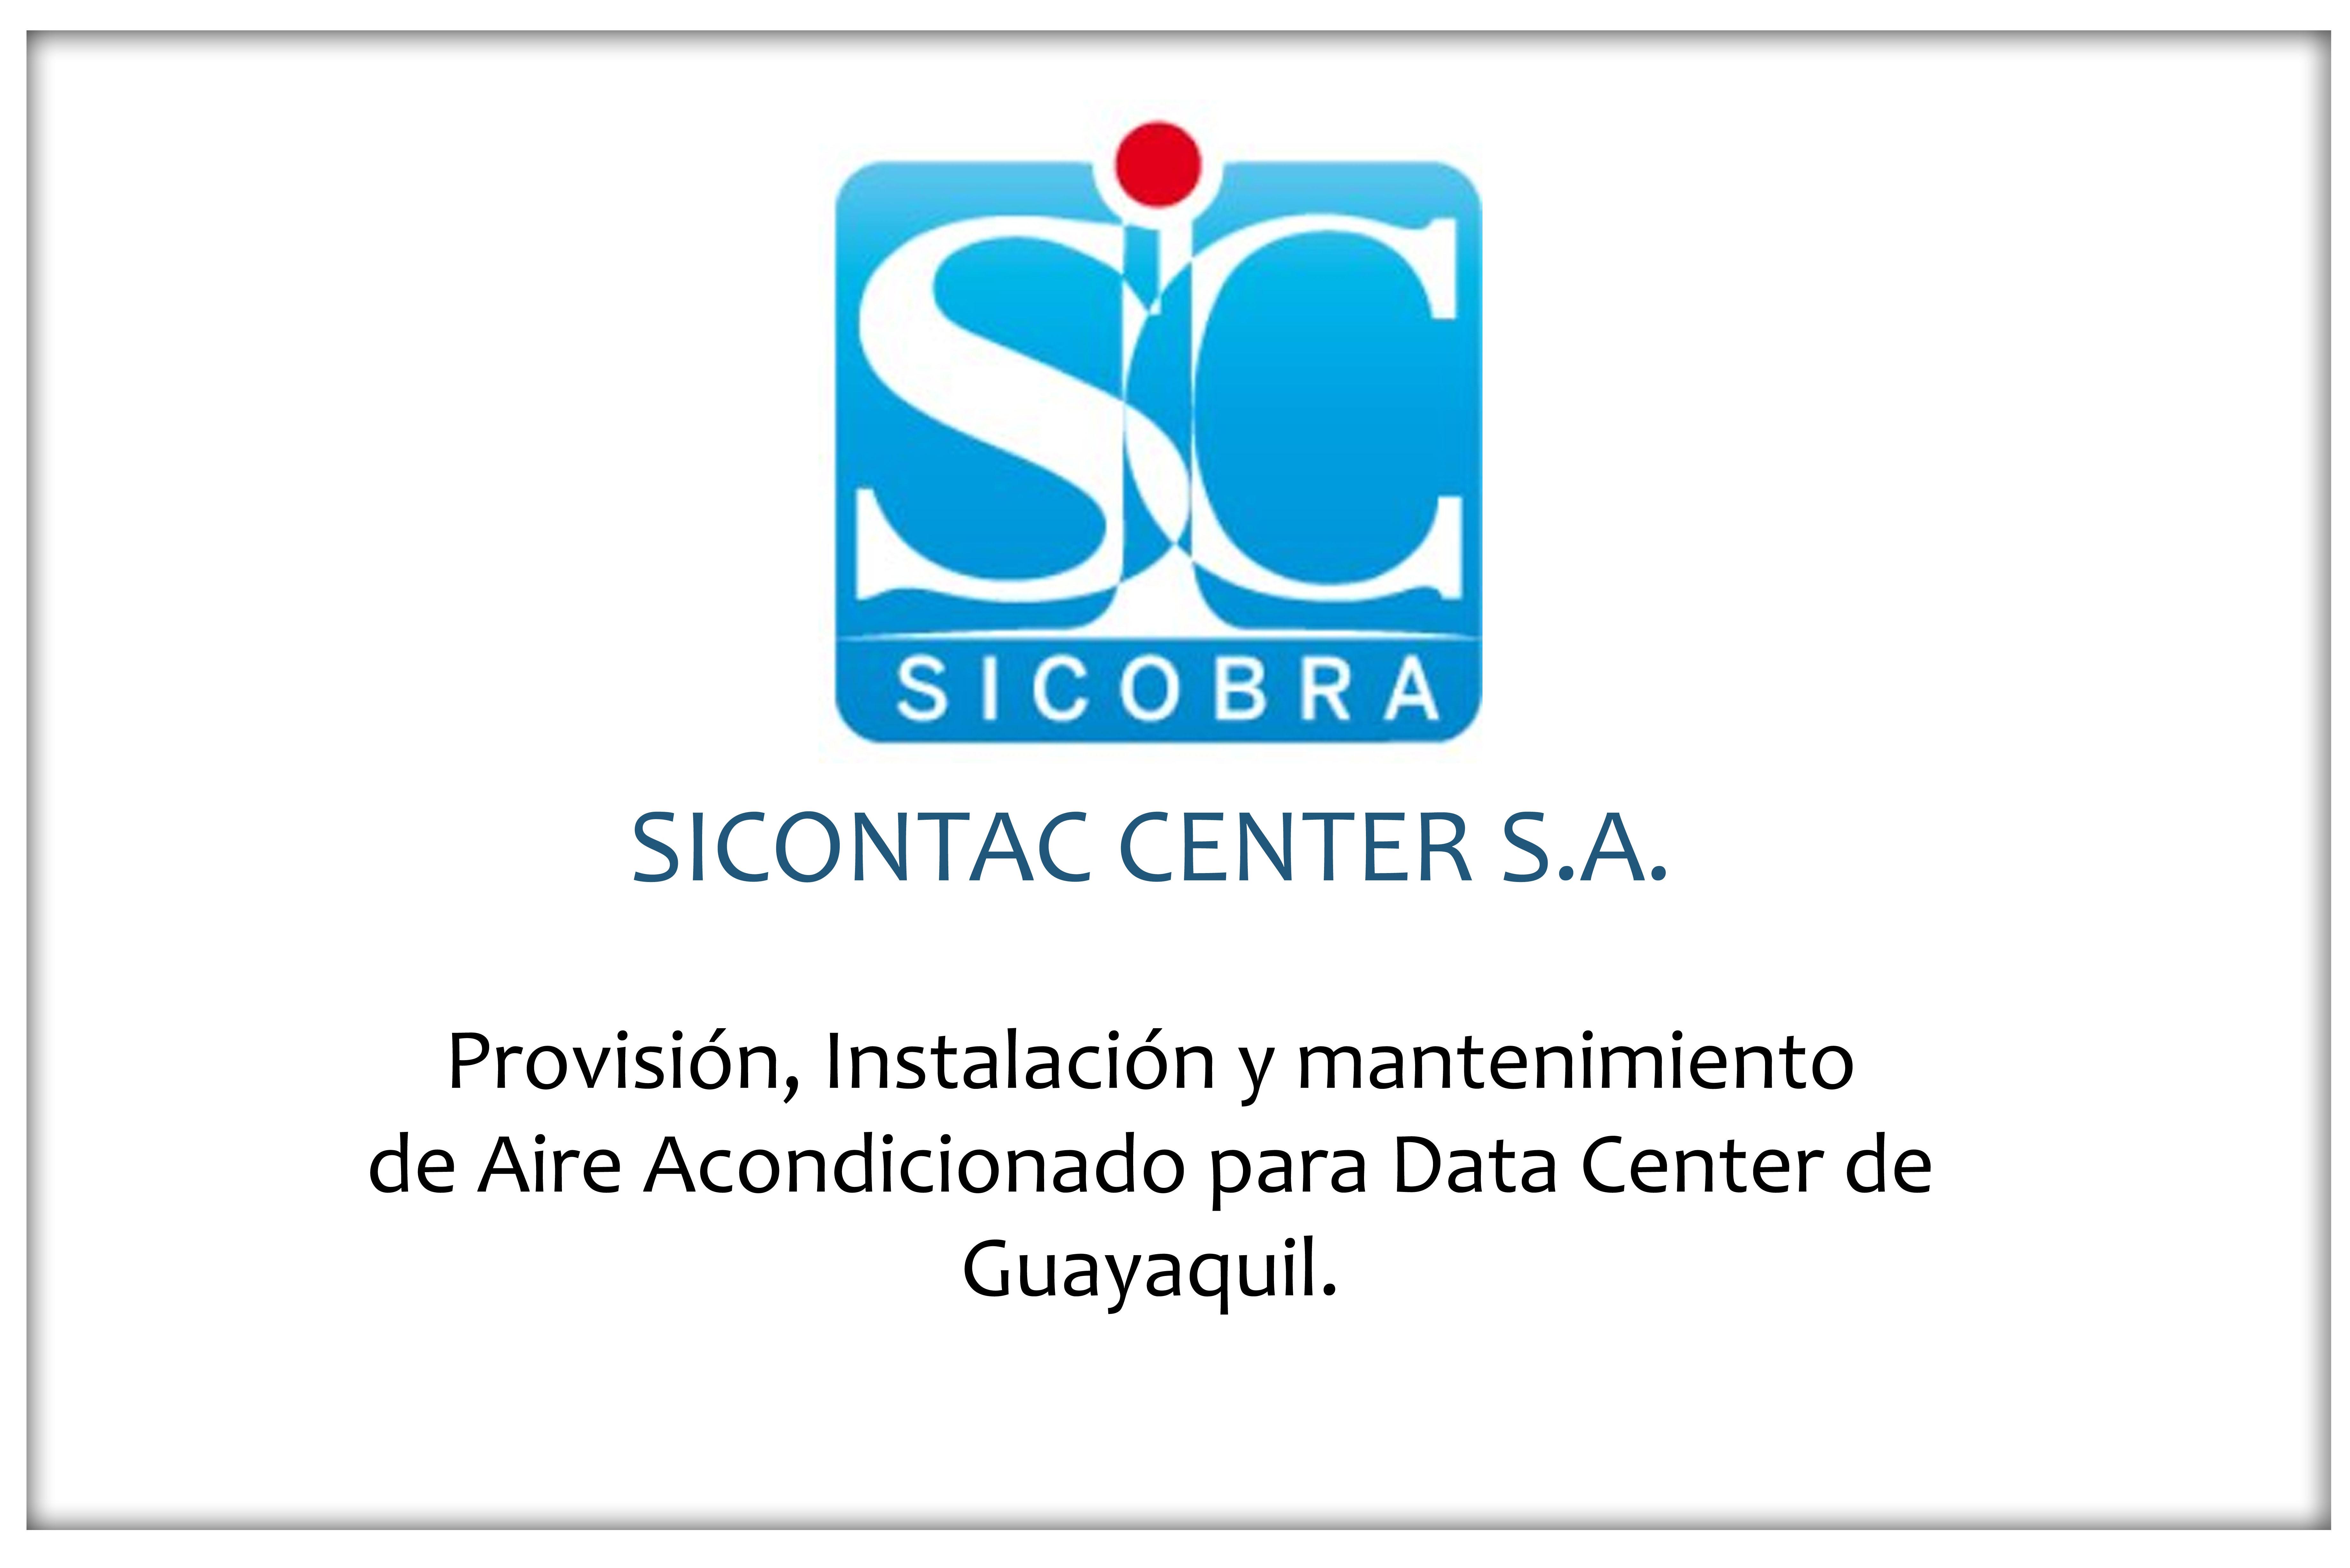 SINCOTAC CENTER